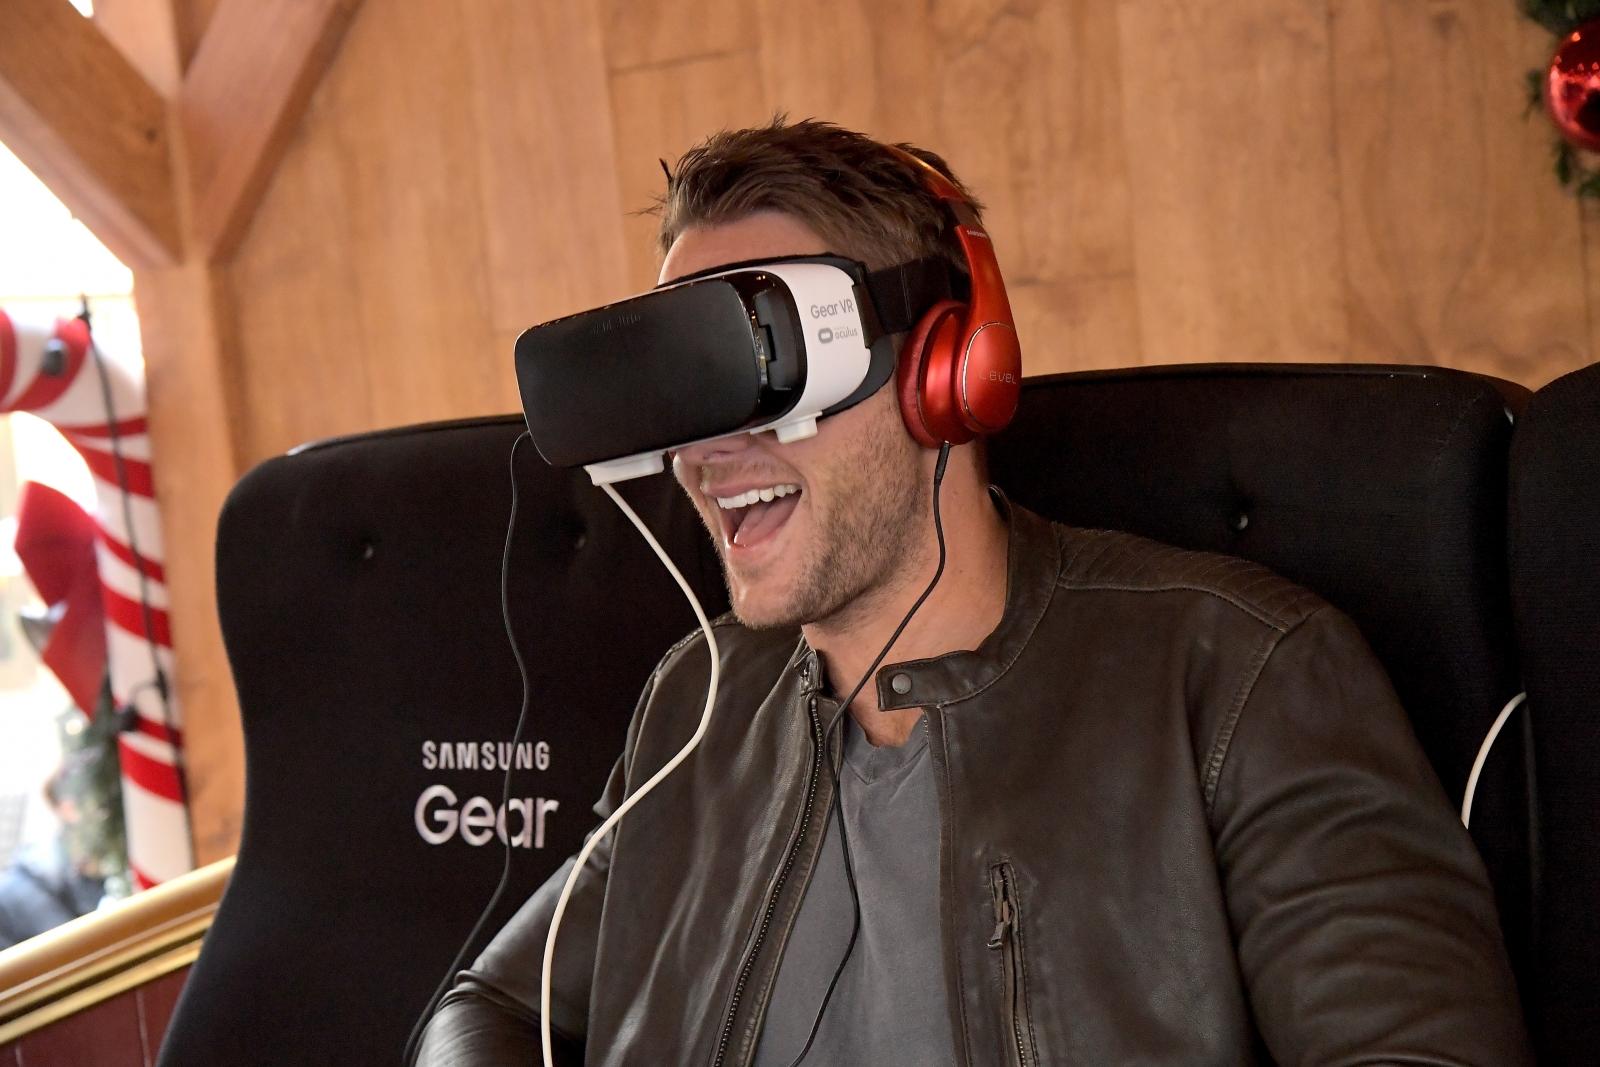 VR porn statistics facts Pornhub